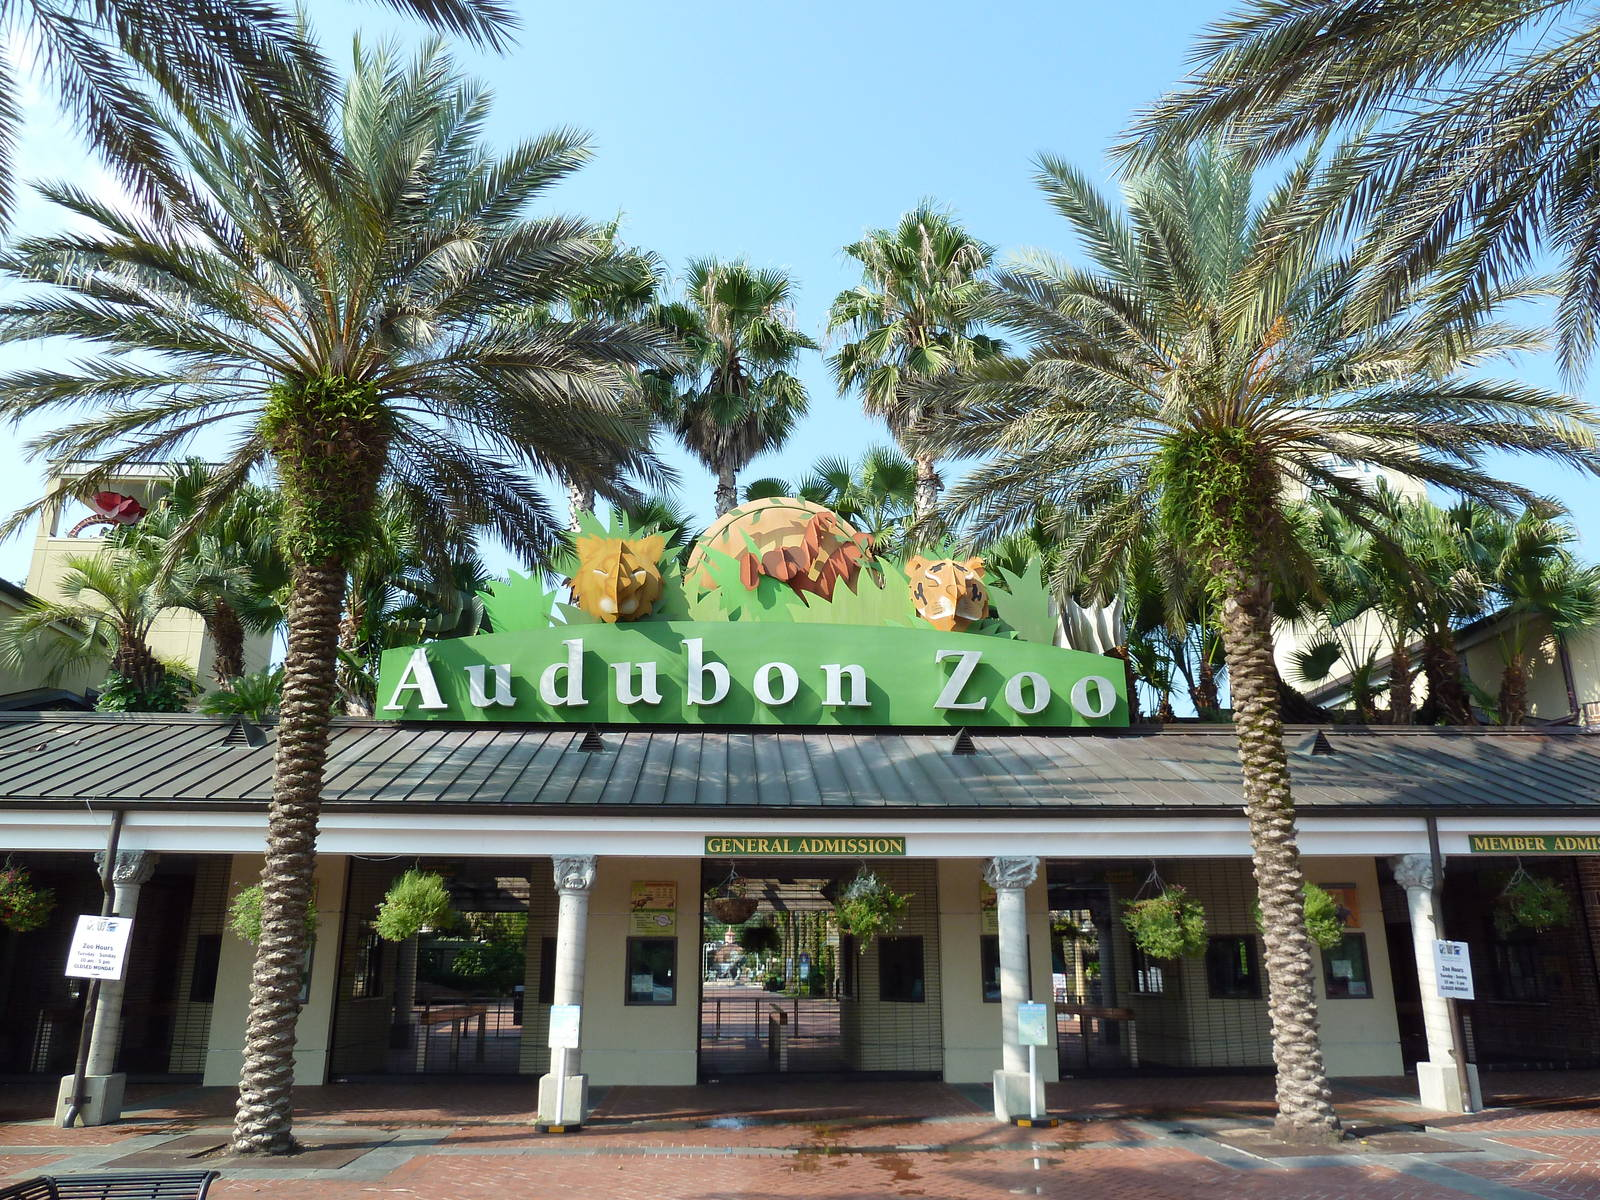 audubon_zoo_001-123679